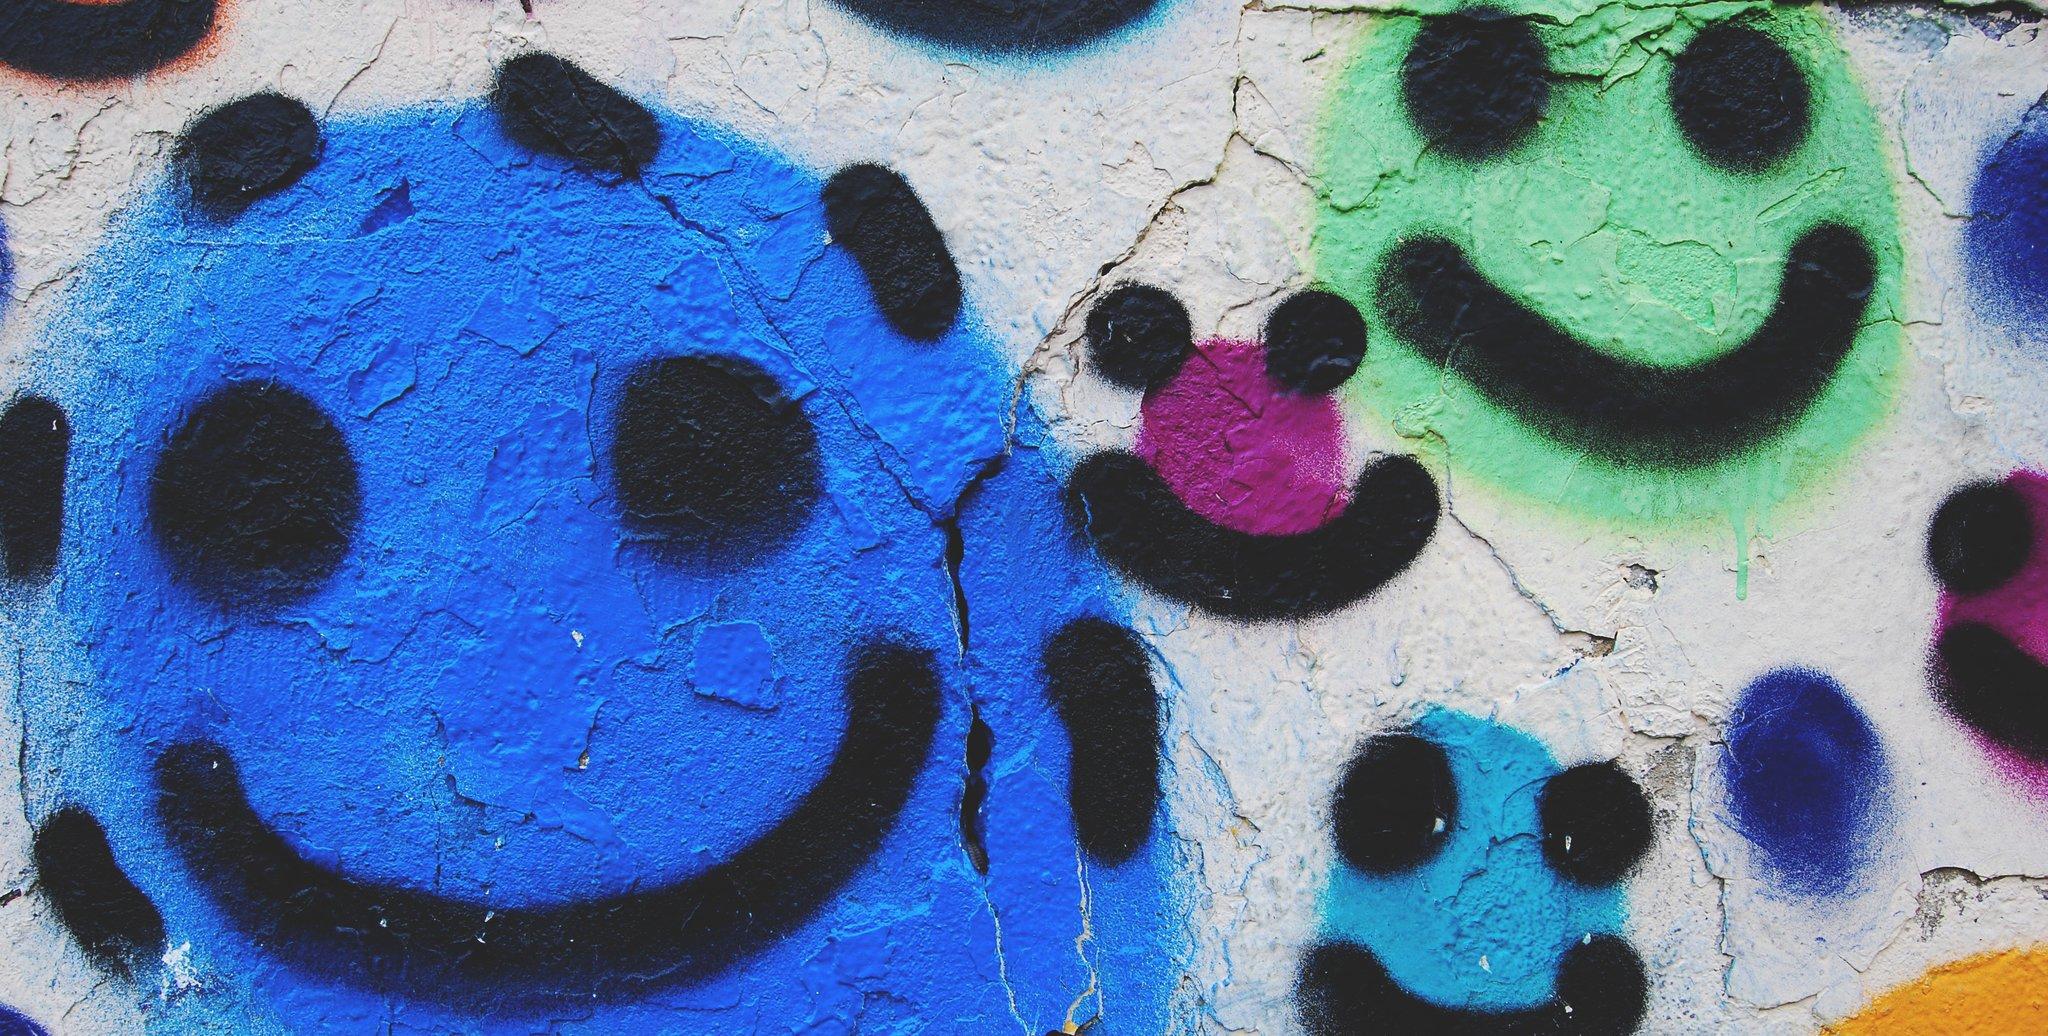 Uśmiechnięte graffiti Uśmiechnięte graffiti Źródło: licencja: CC 0.